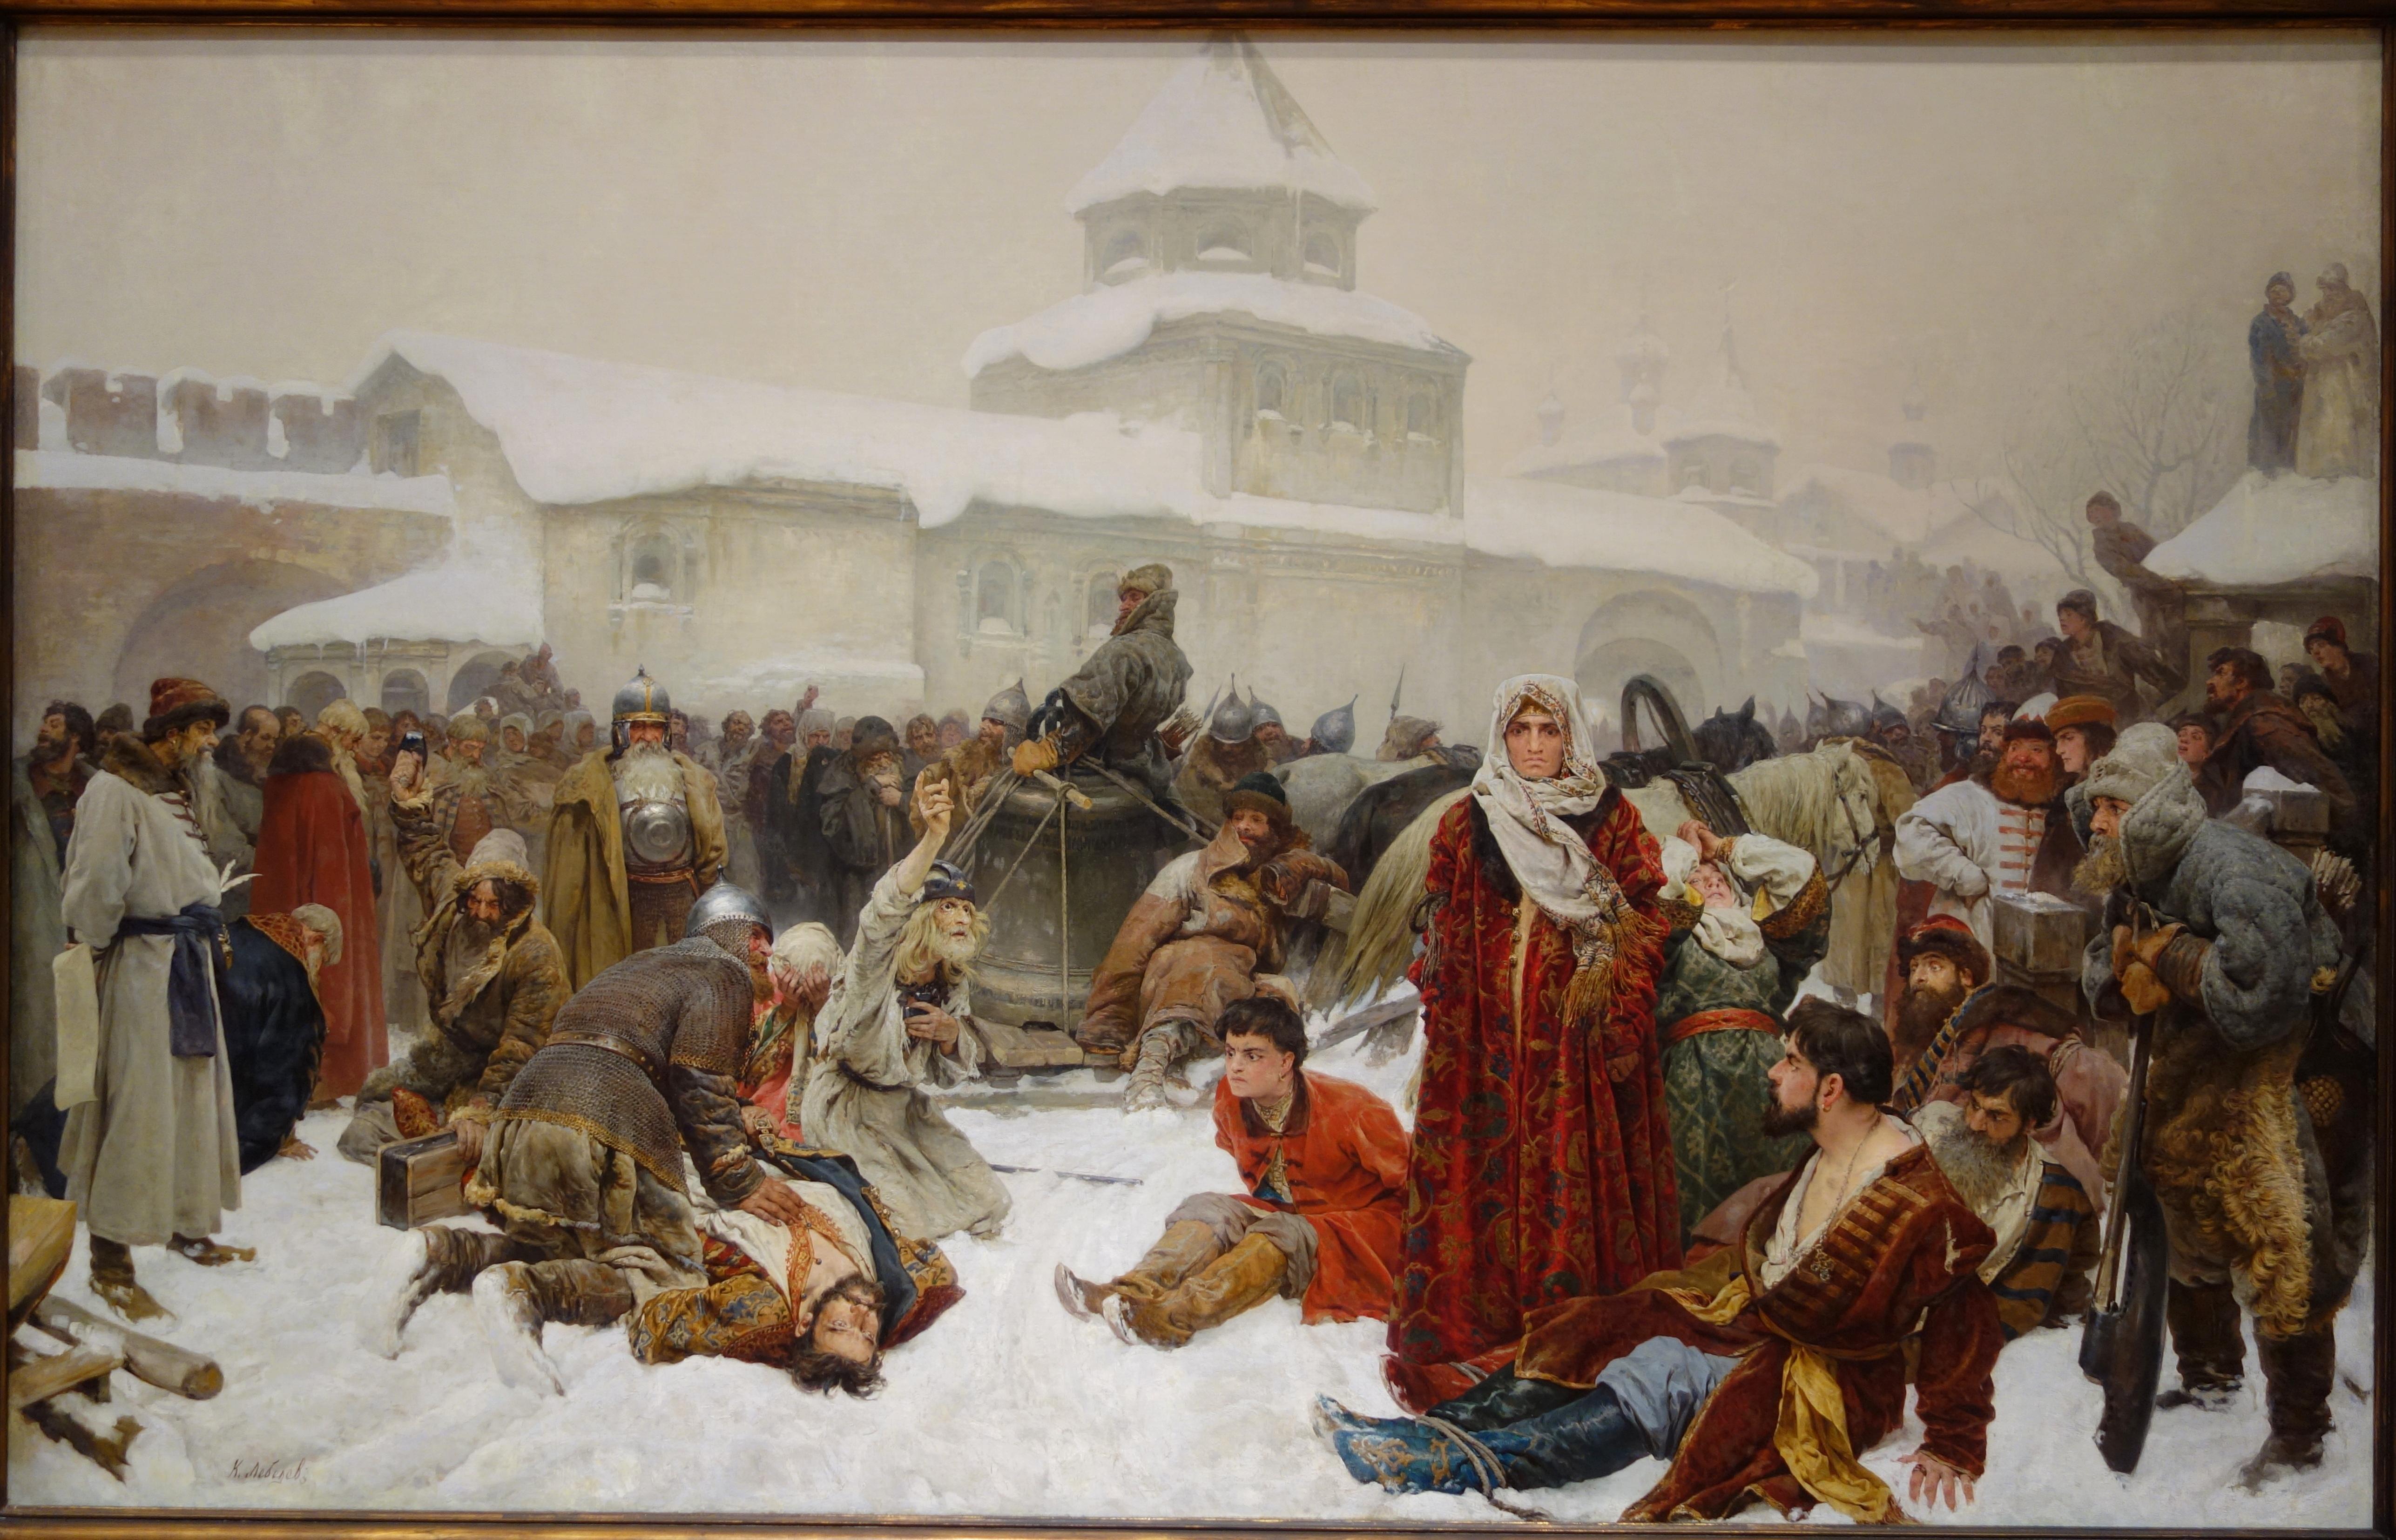 Chazen Art Museum Paintings